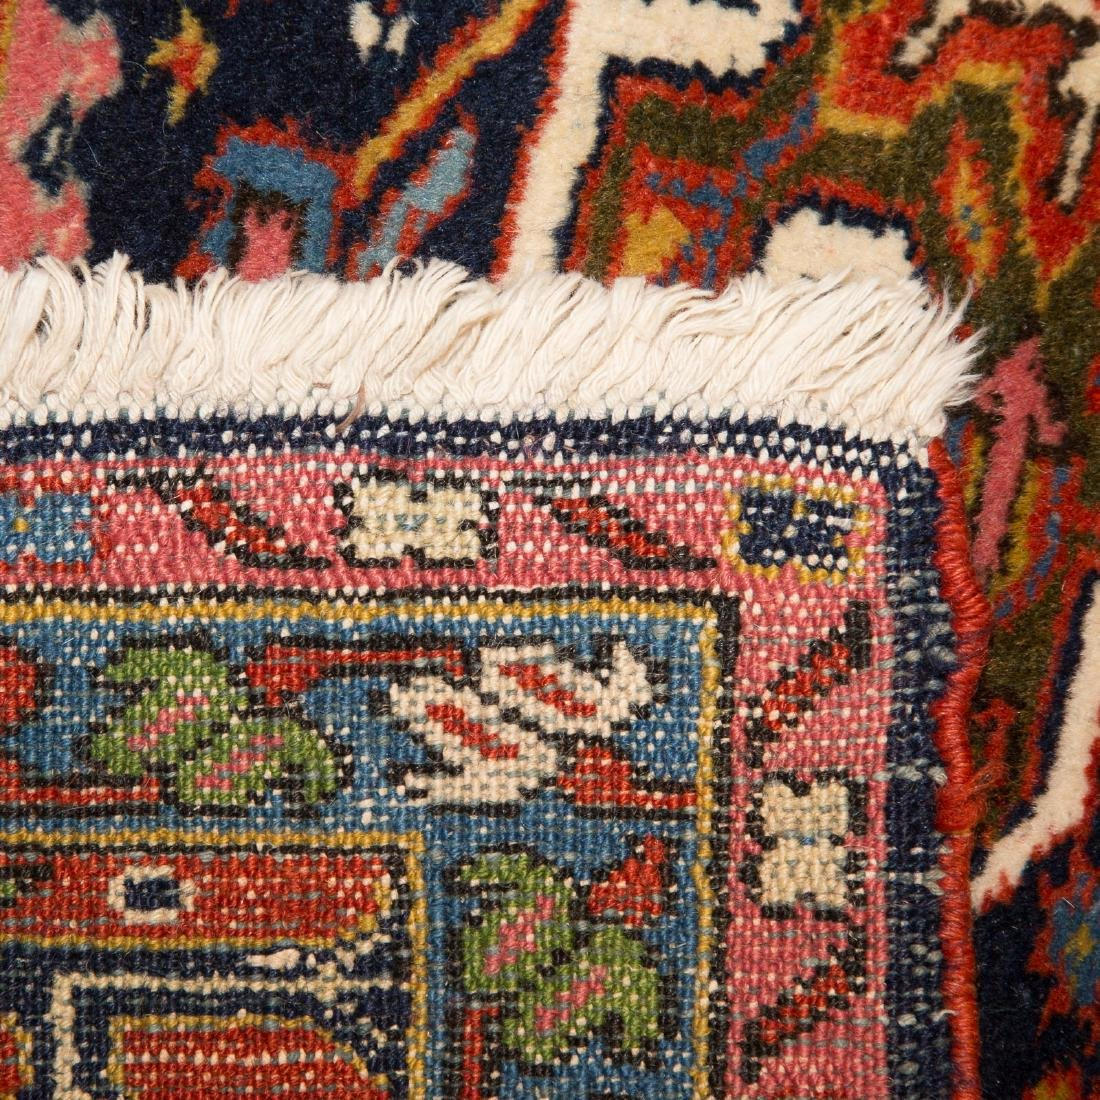 Antique Karaja Herez rug, approx. 8.5 x 10.1 - 3